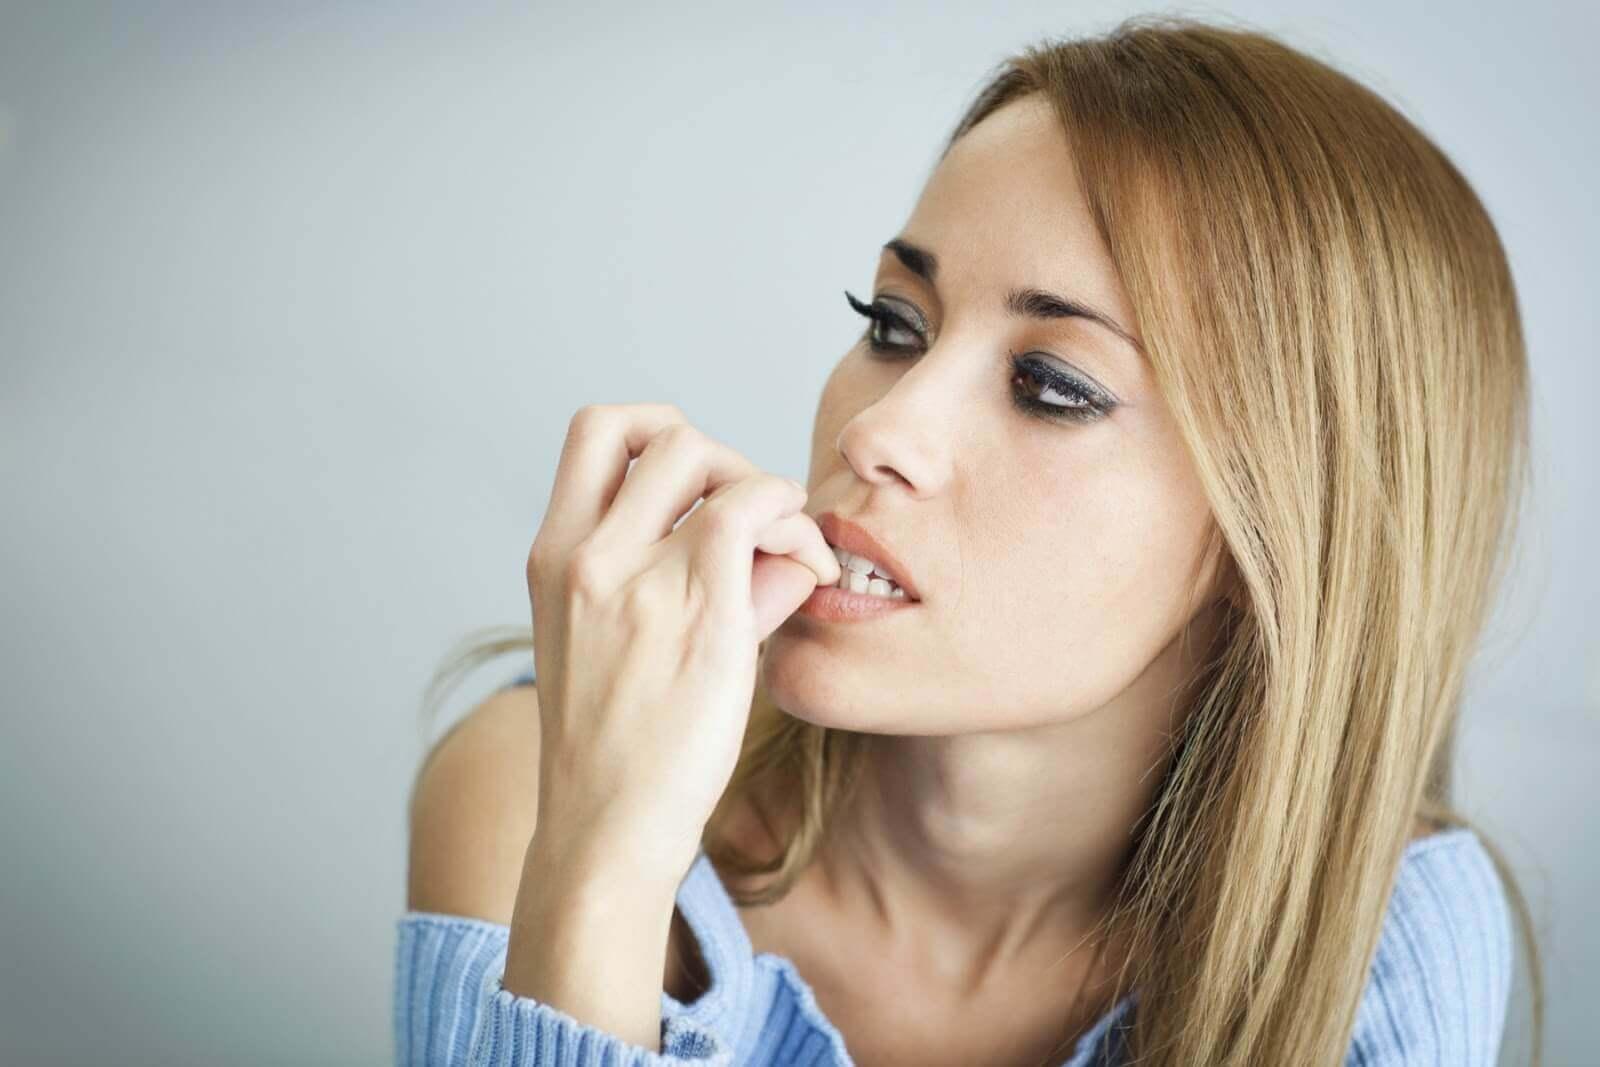 Kvinder bider negle paa grund af angst